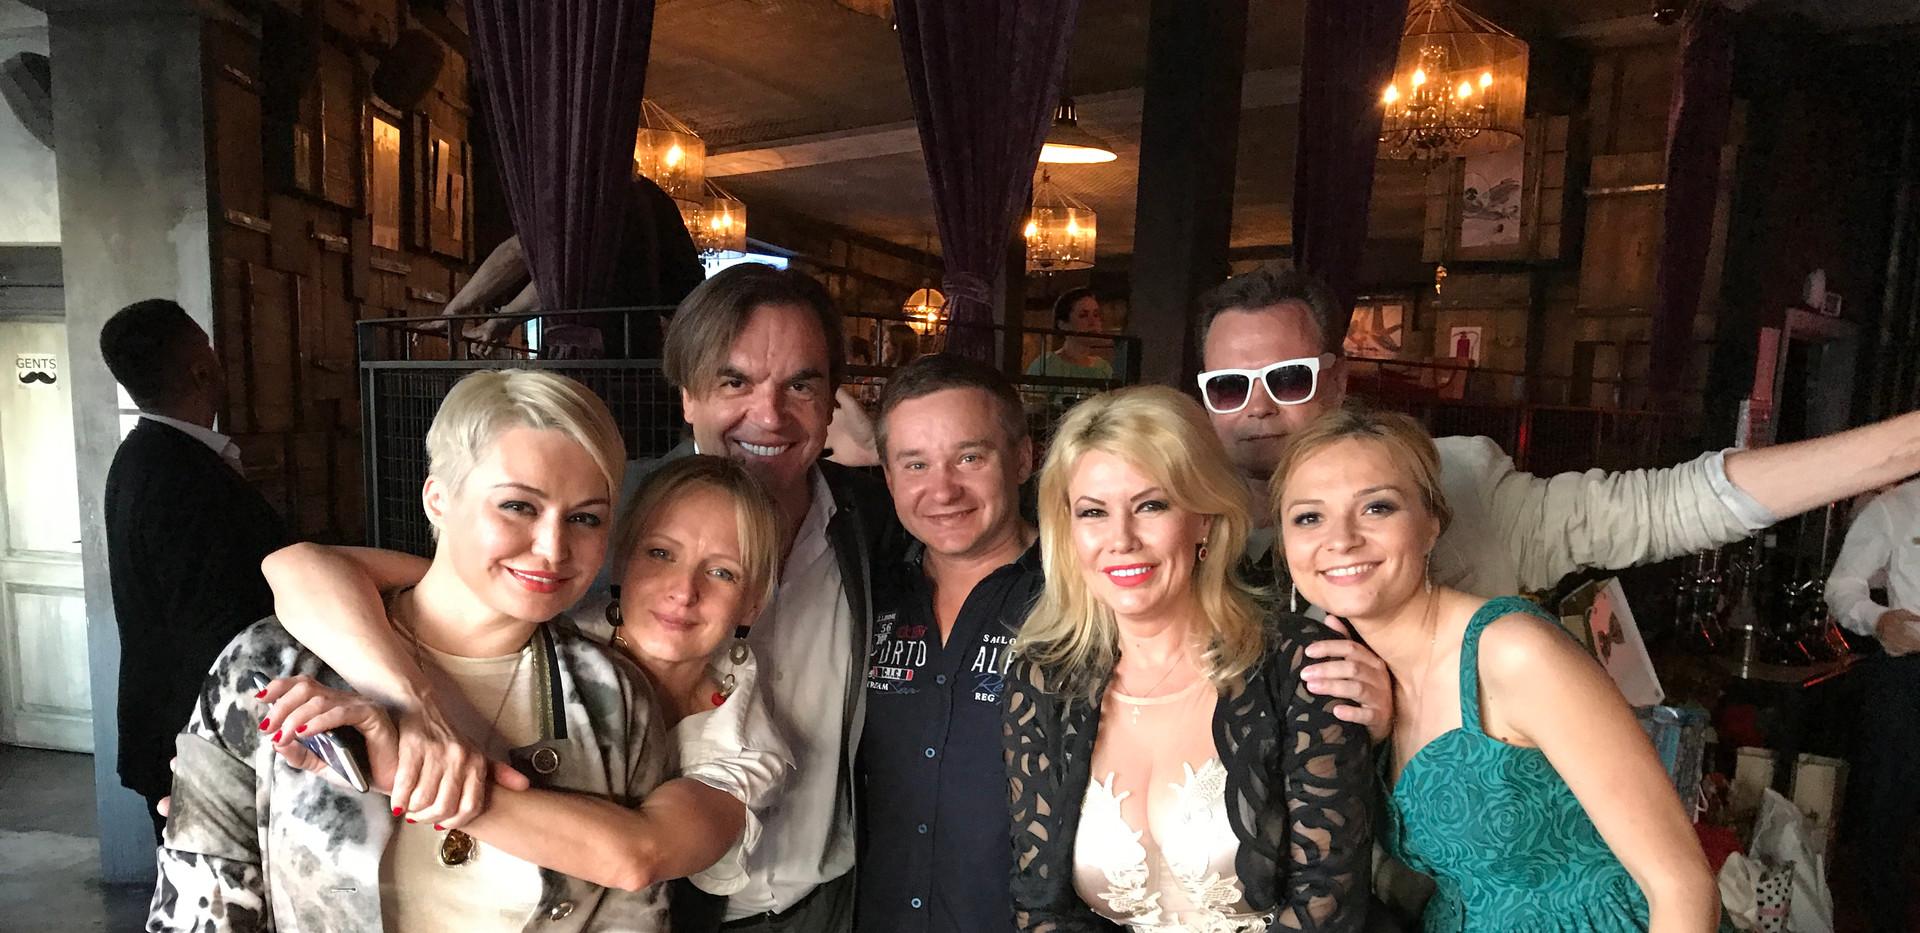 Firmenfeier mit Stars der russischen Szene